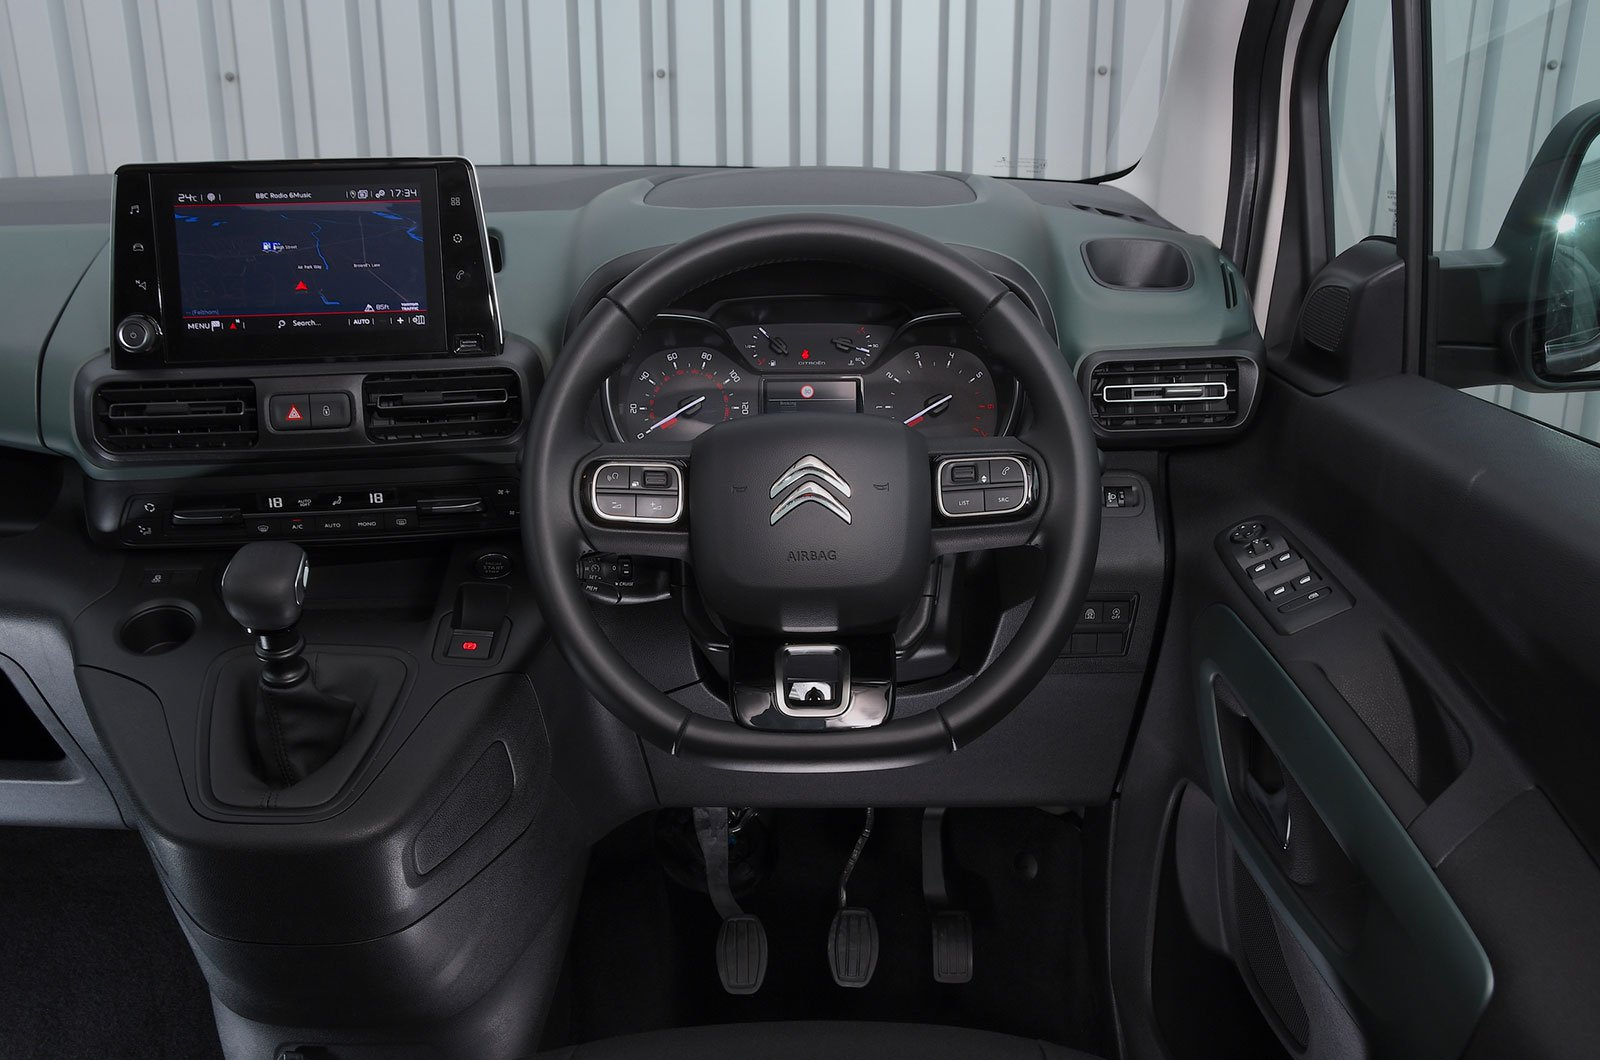 Citroën Berlingo 1.2 Puretech M Feel - interior